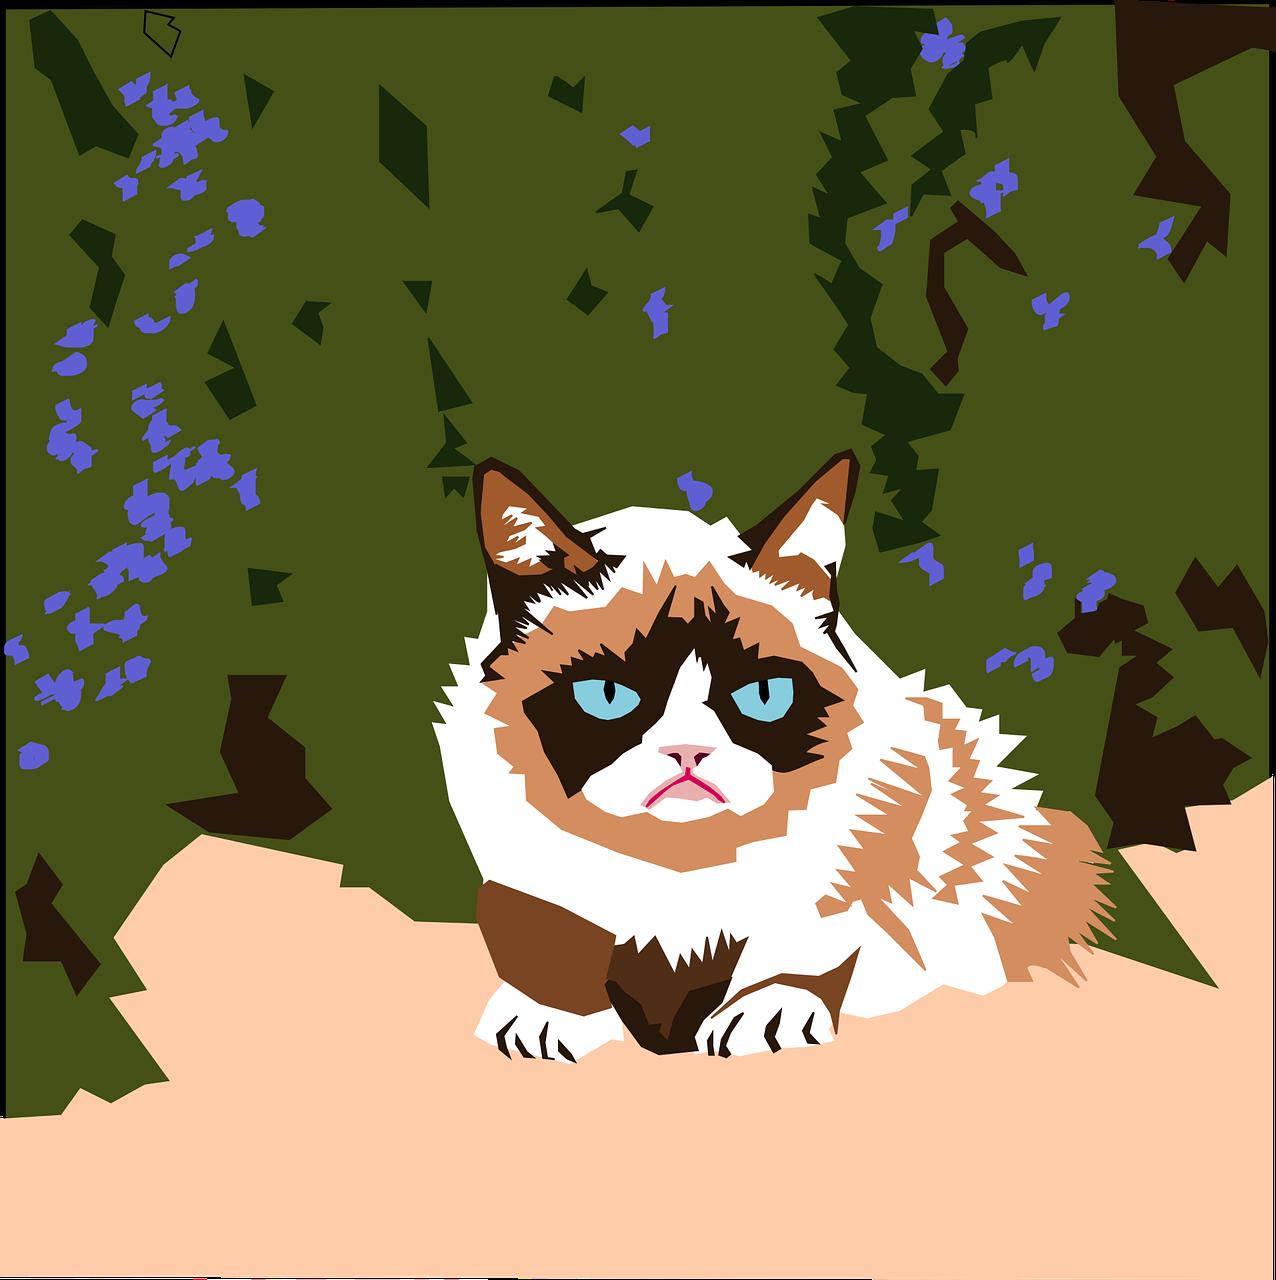 Grumpy cat pixelated